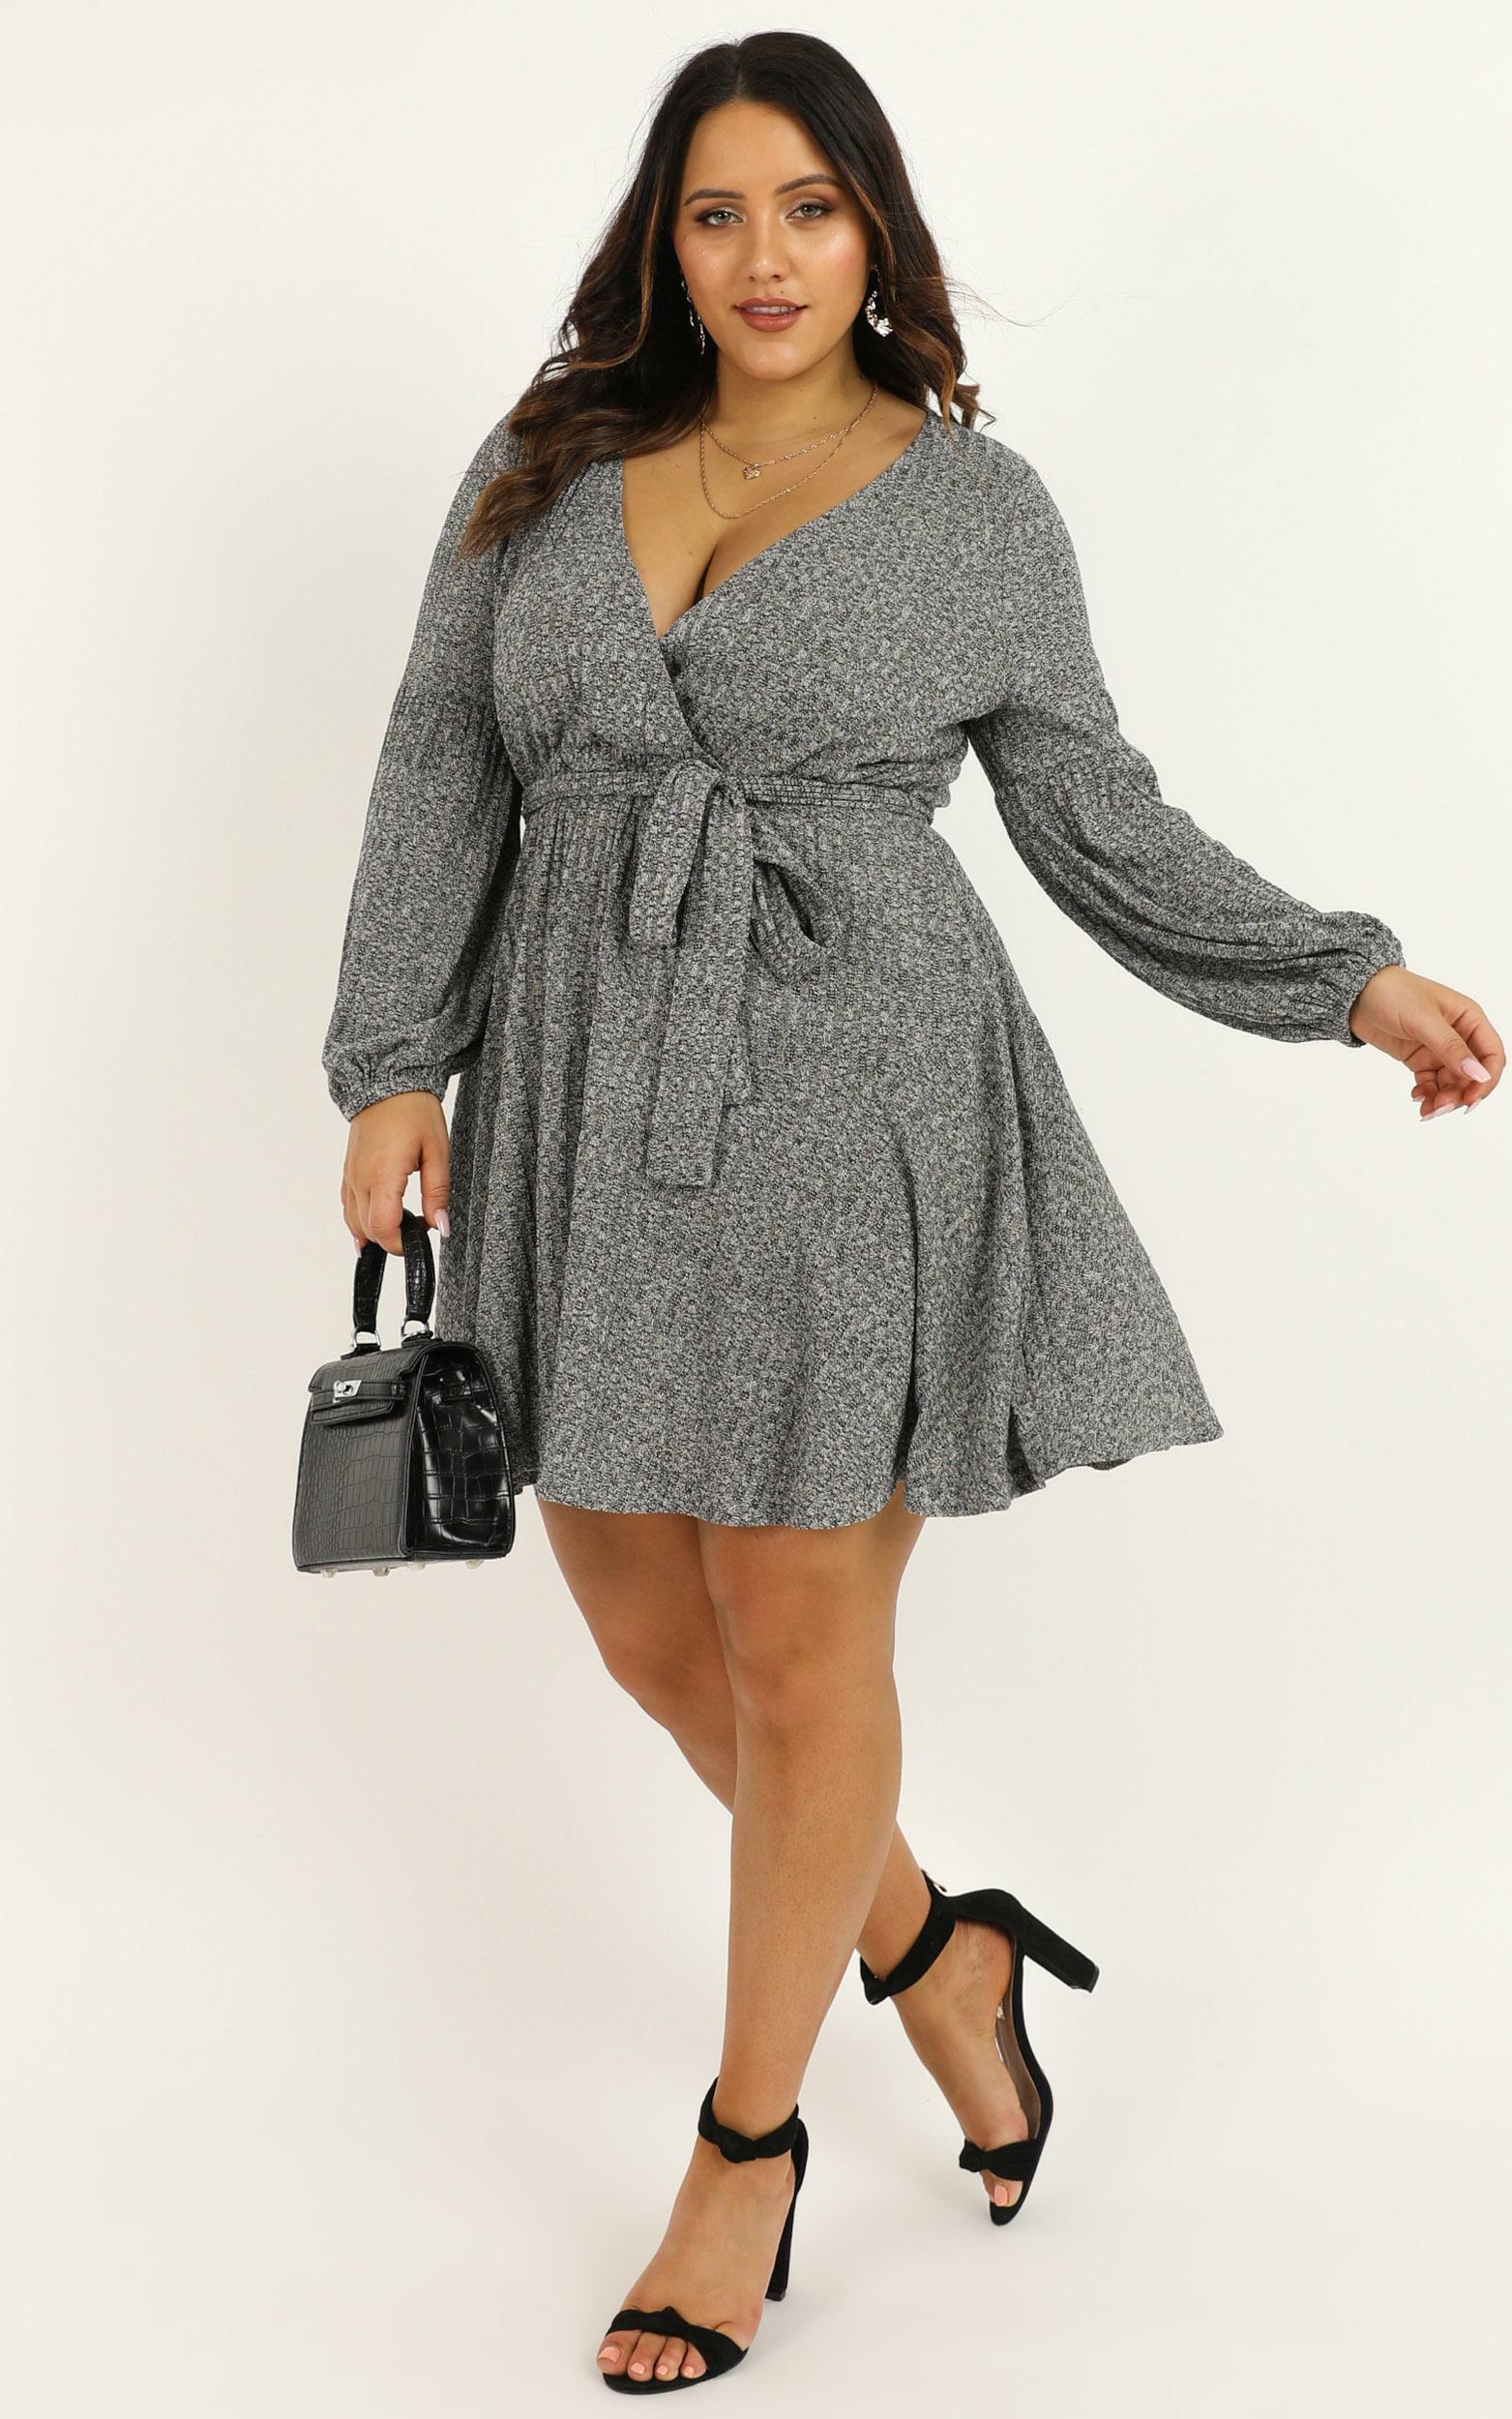 My Own Hero Dress in grey - 20 (XXXXL), Grey, hi-res image number null